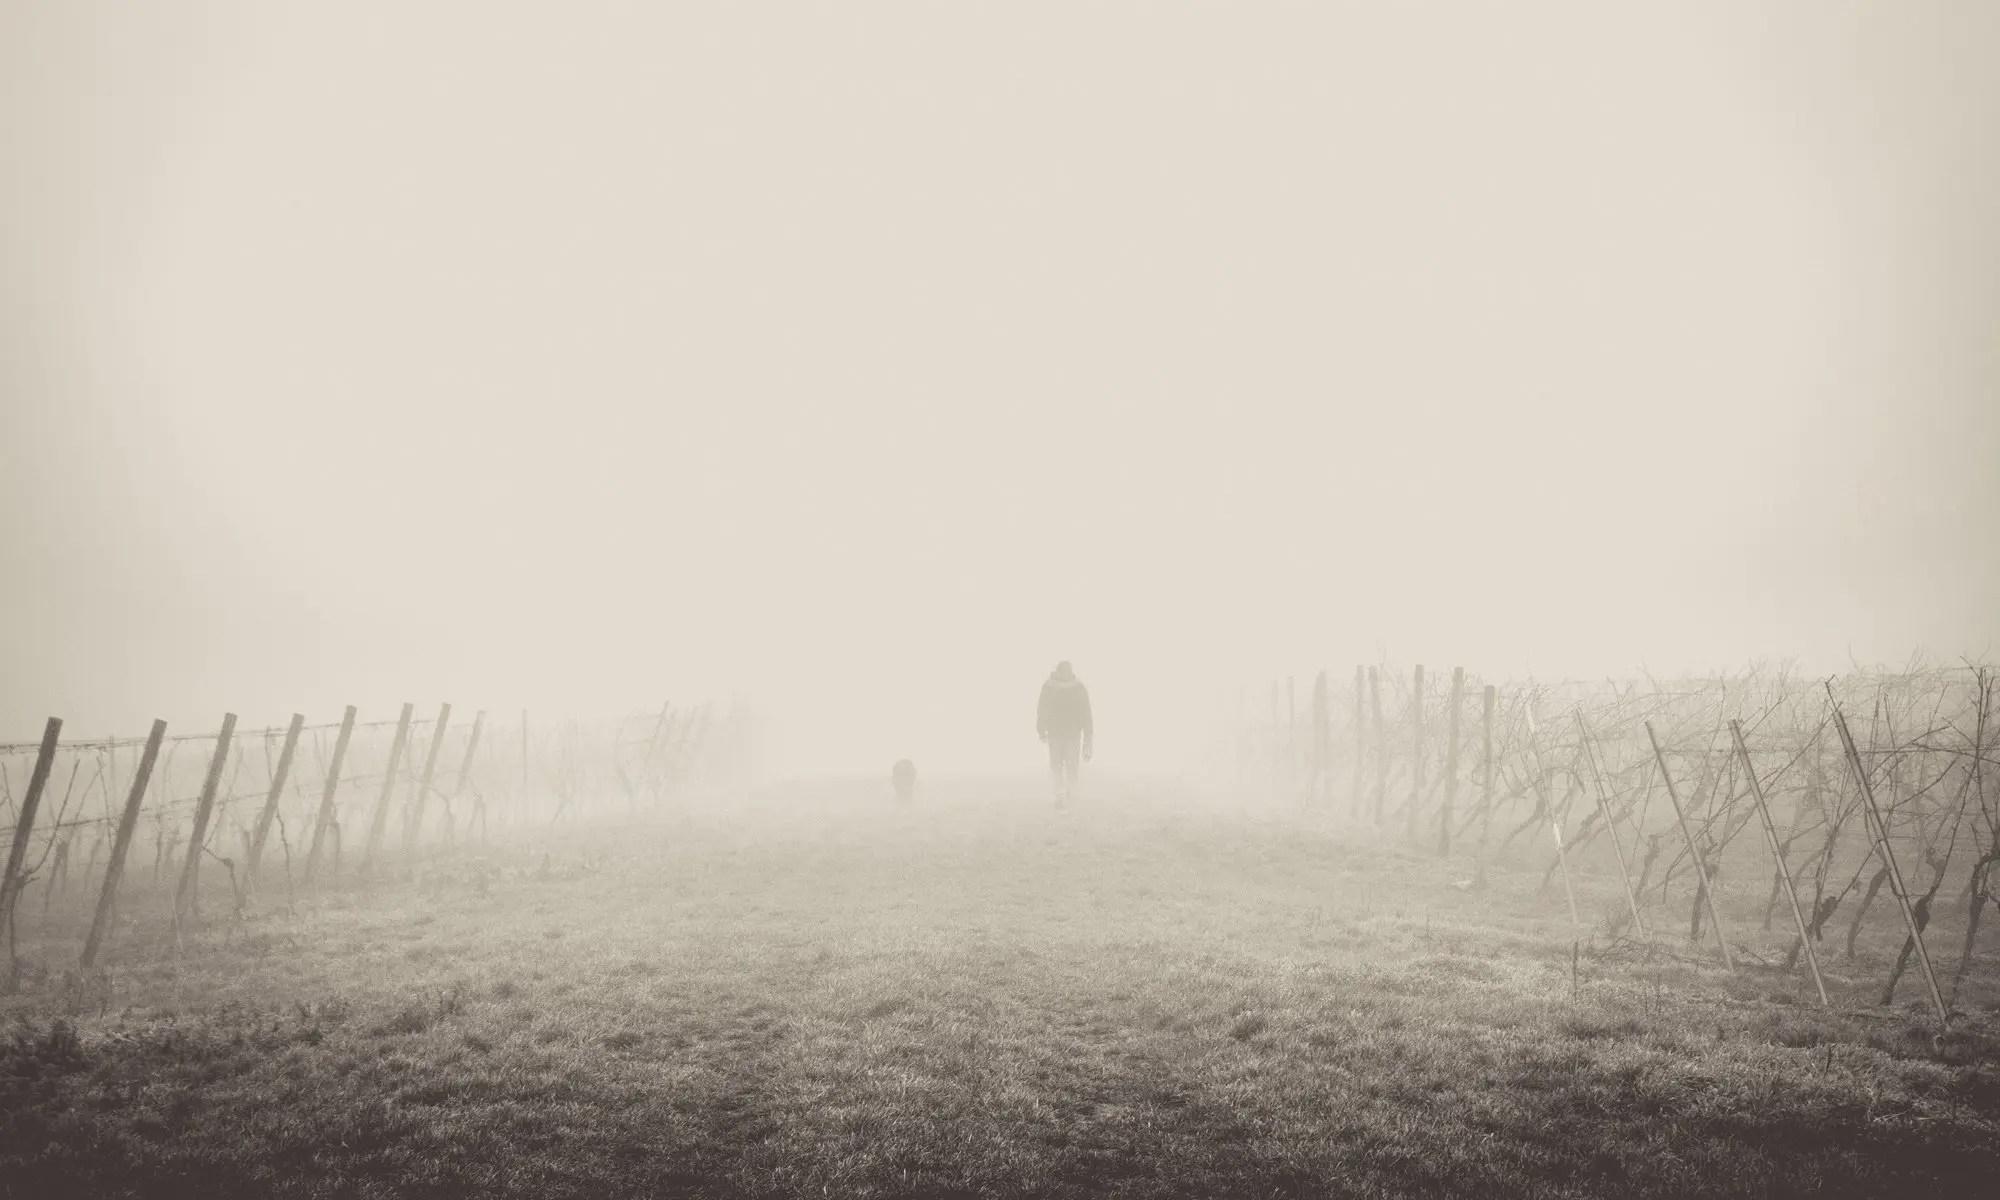 walking in fog image